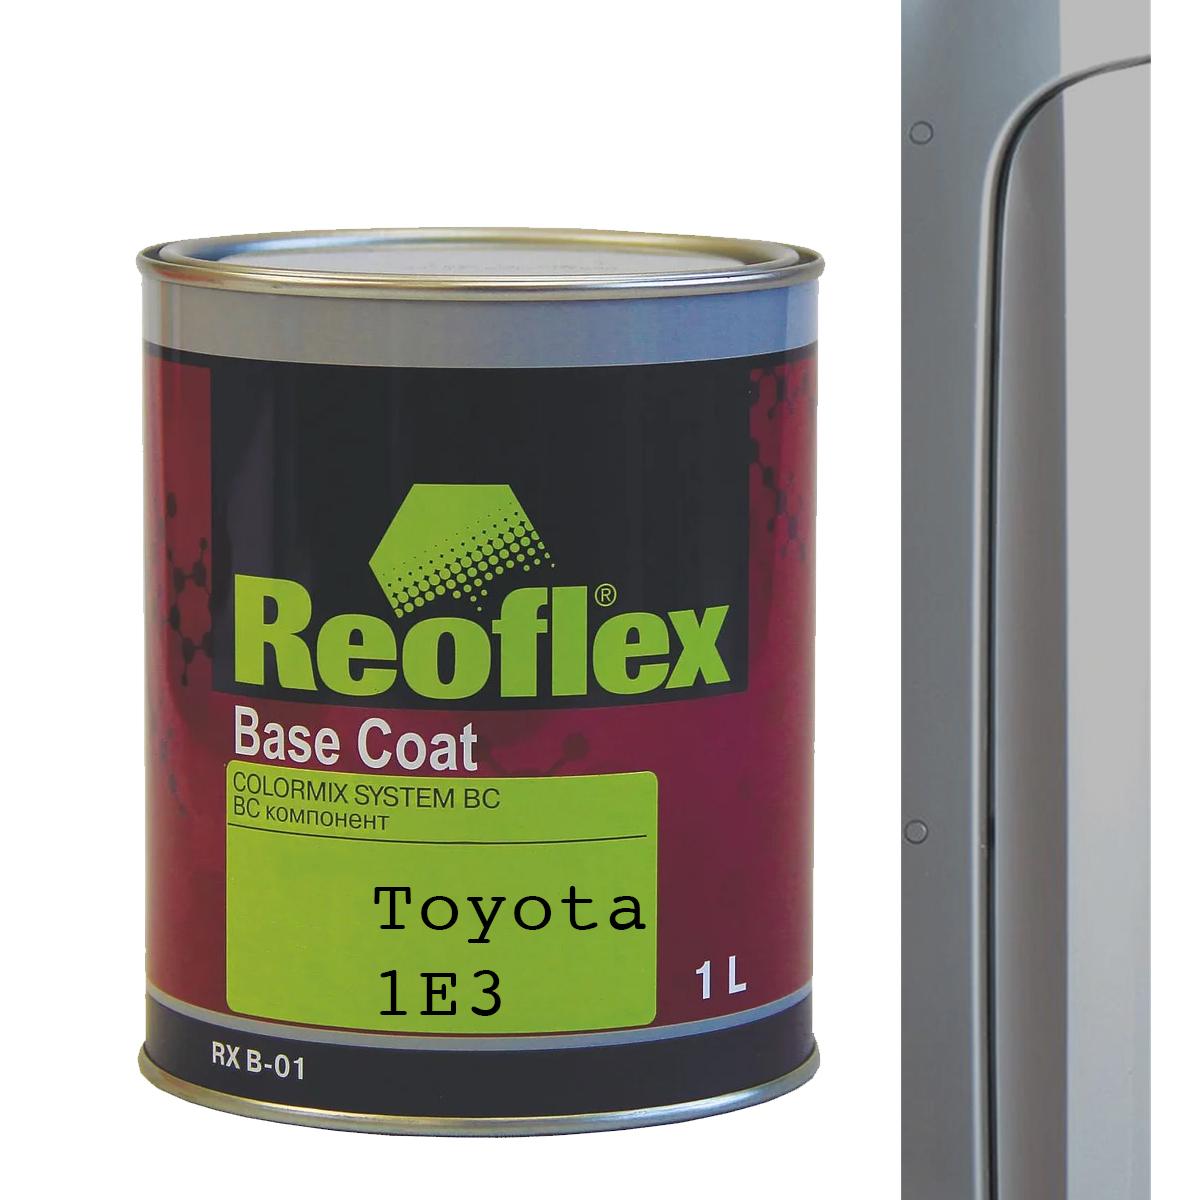 Reoflex Toyota 1E3